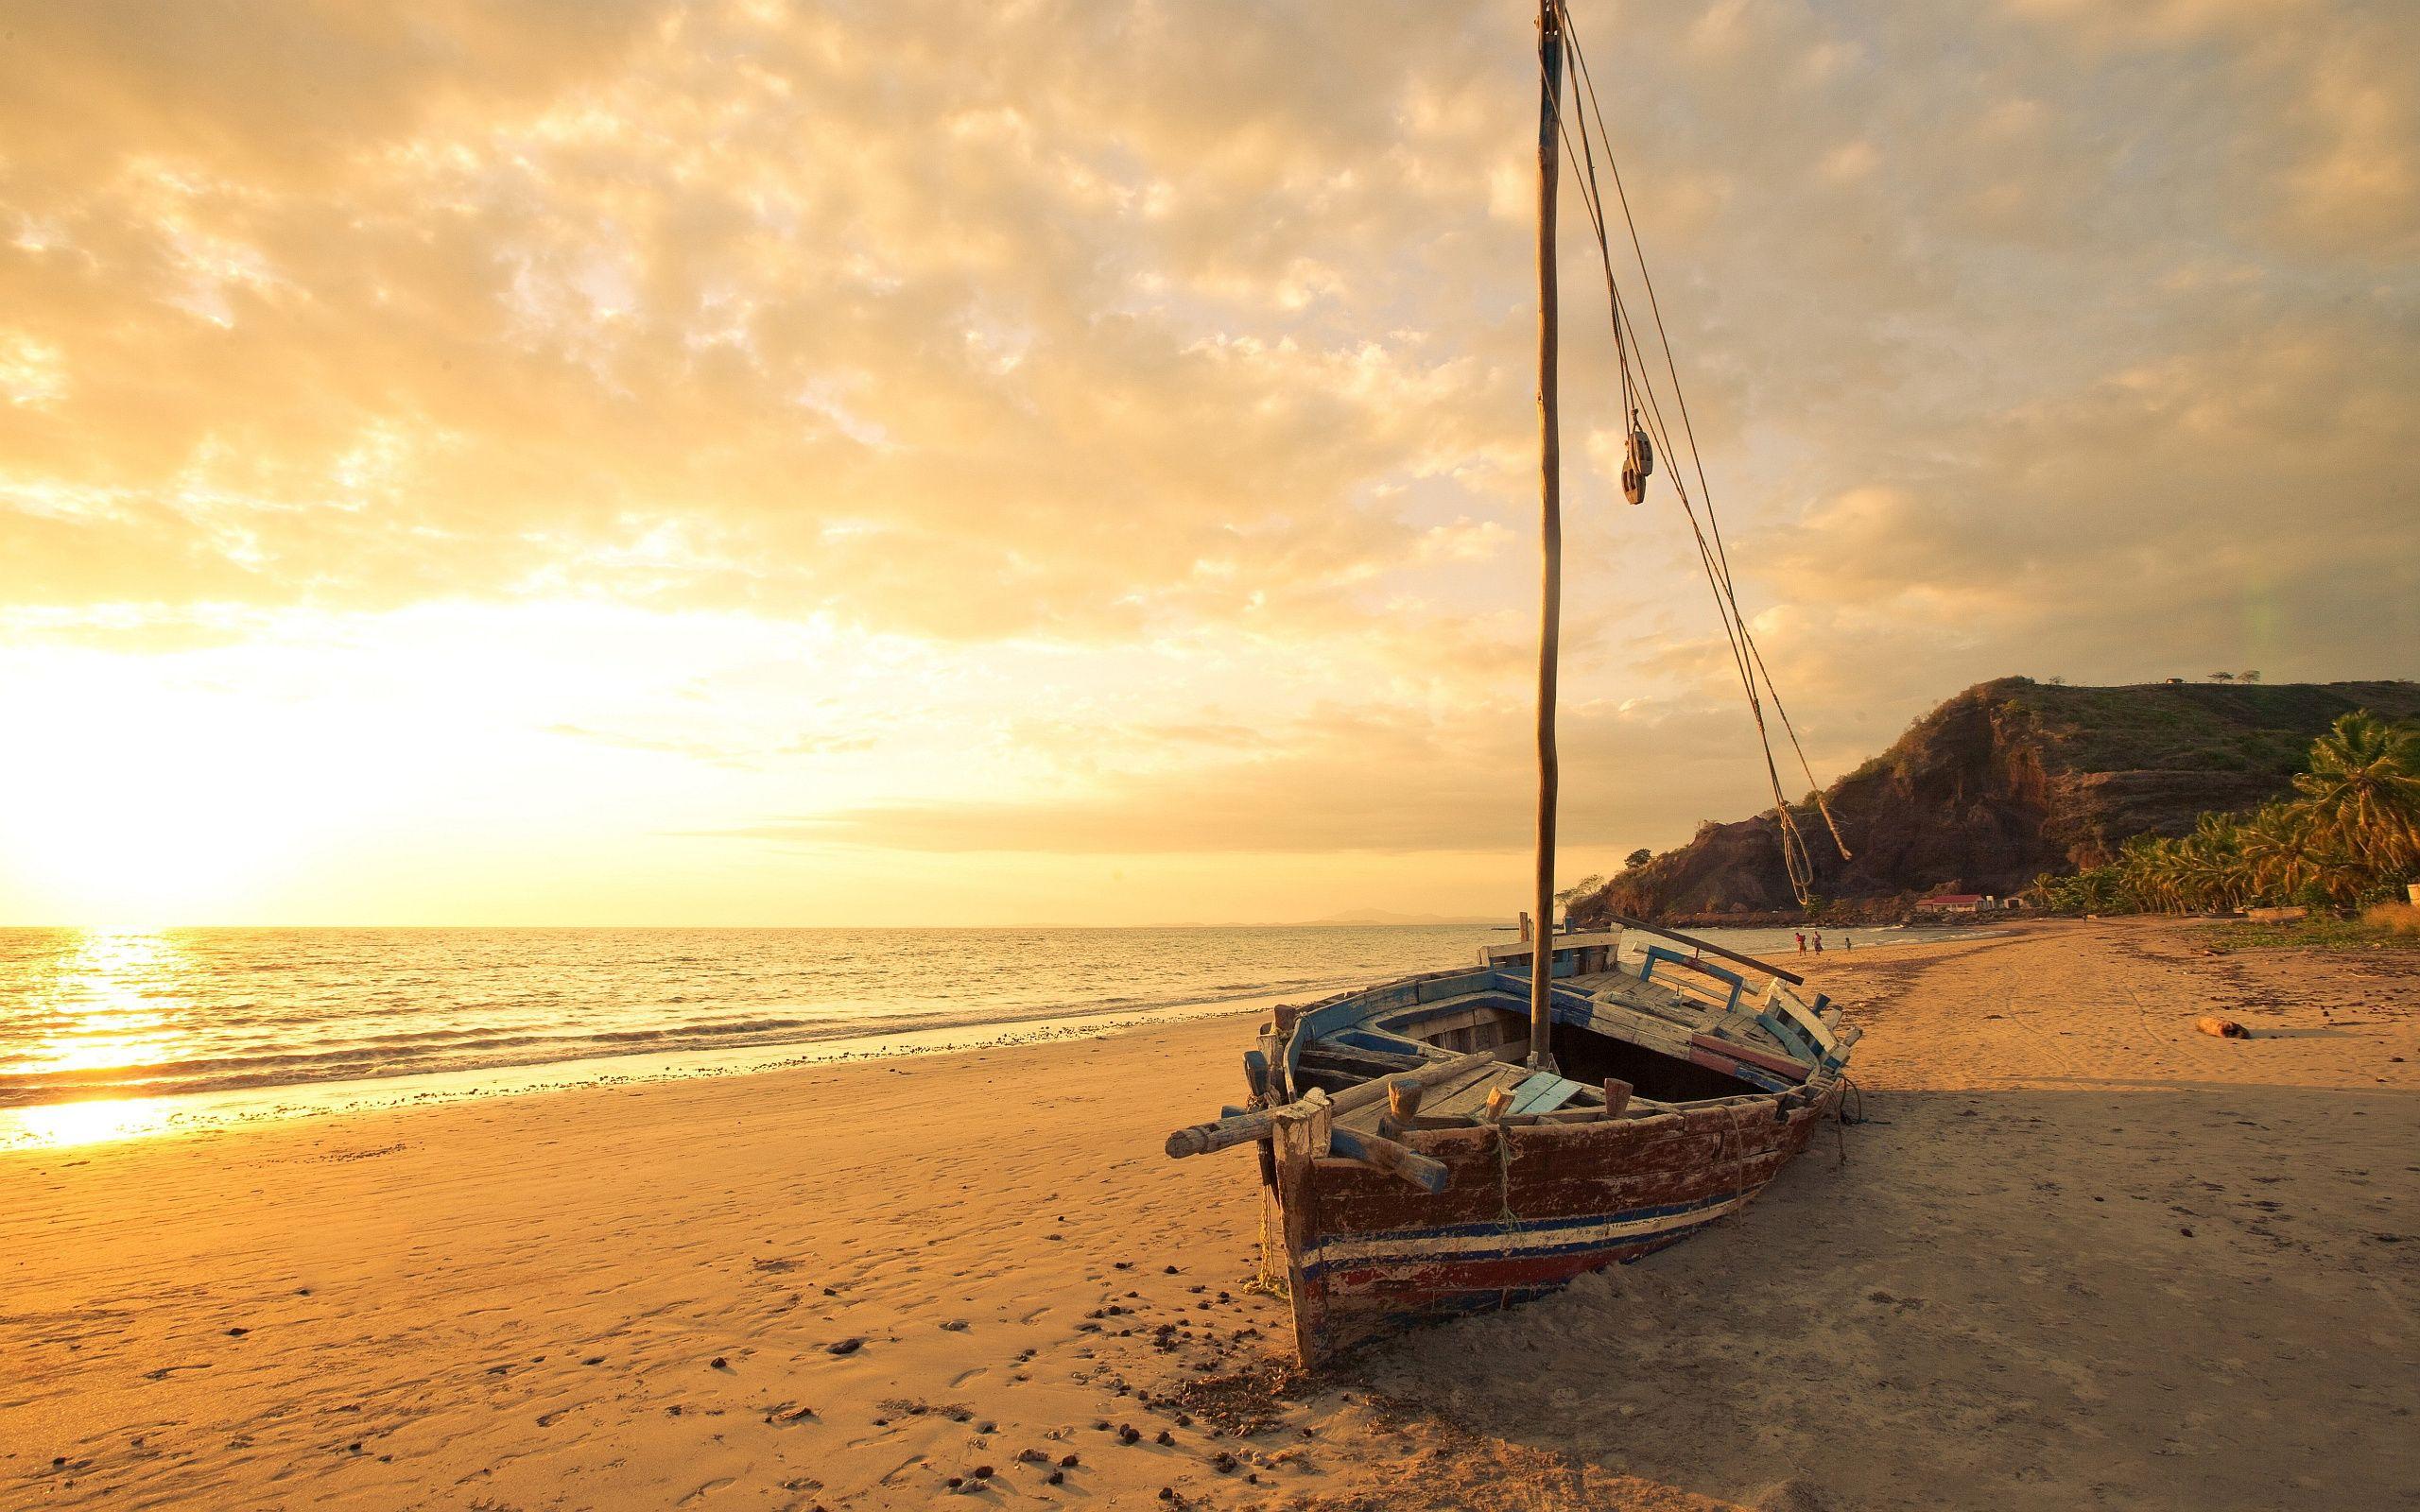 Alone Boat In Sea Wallpapers For Desktop